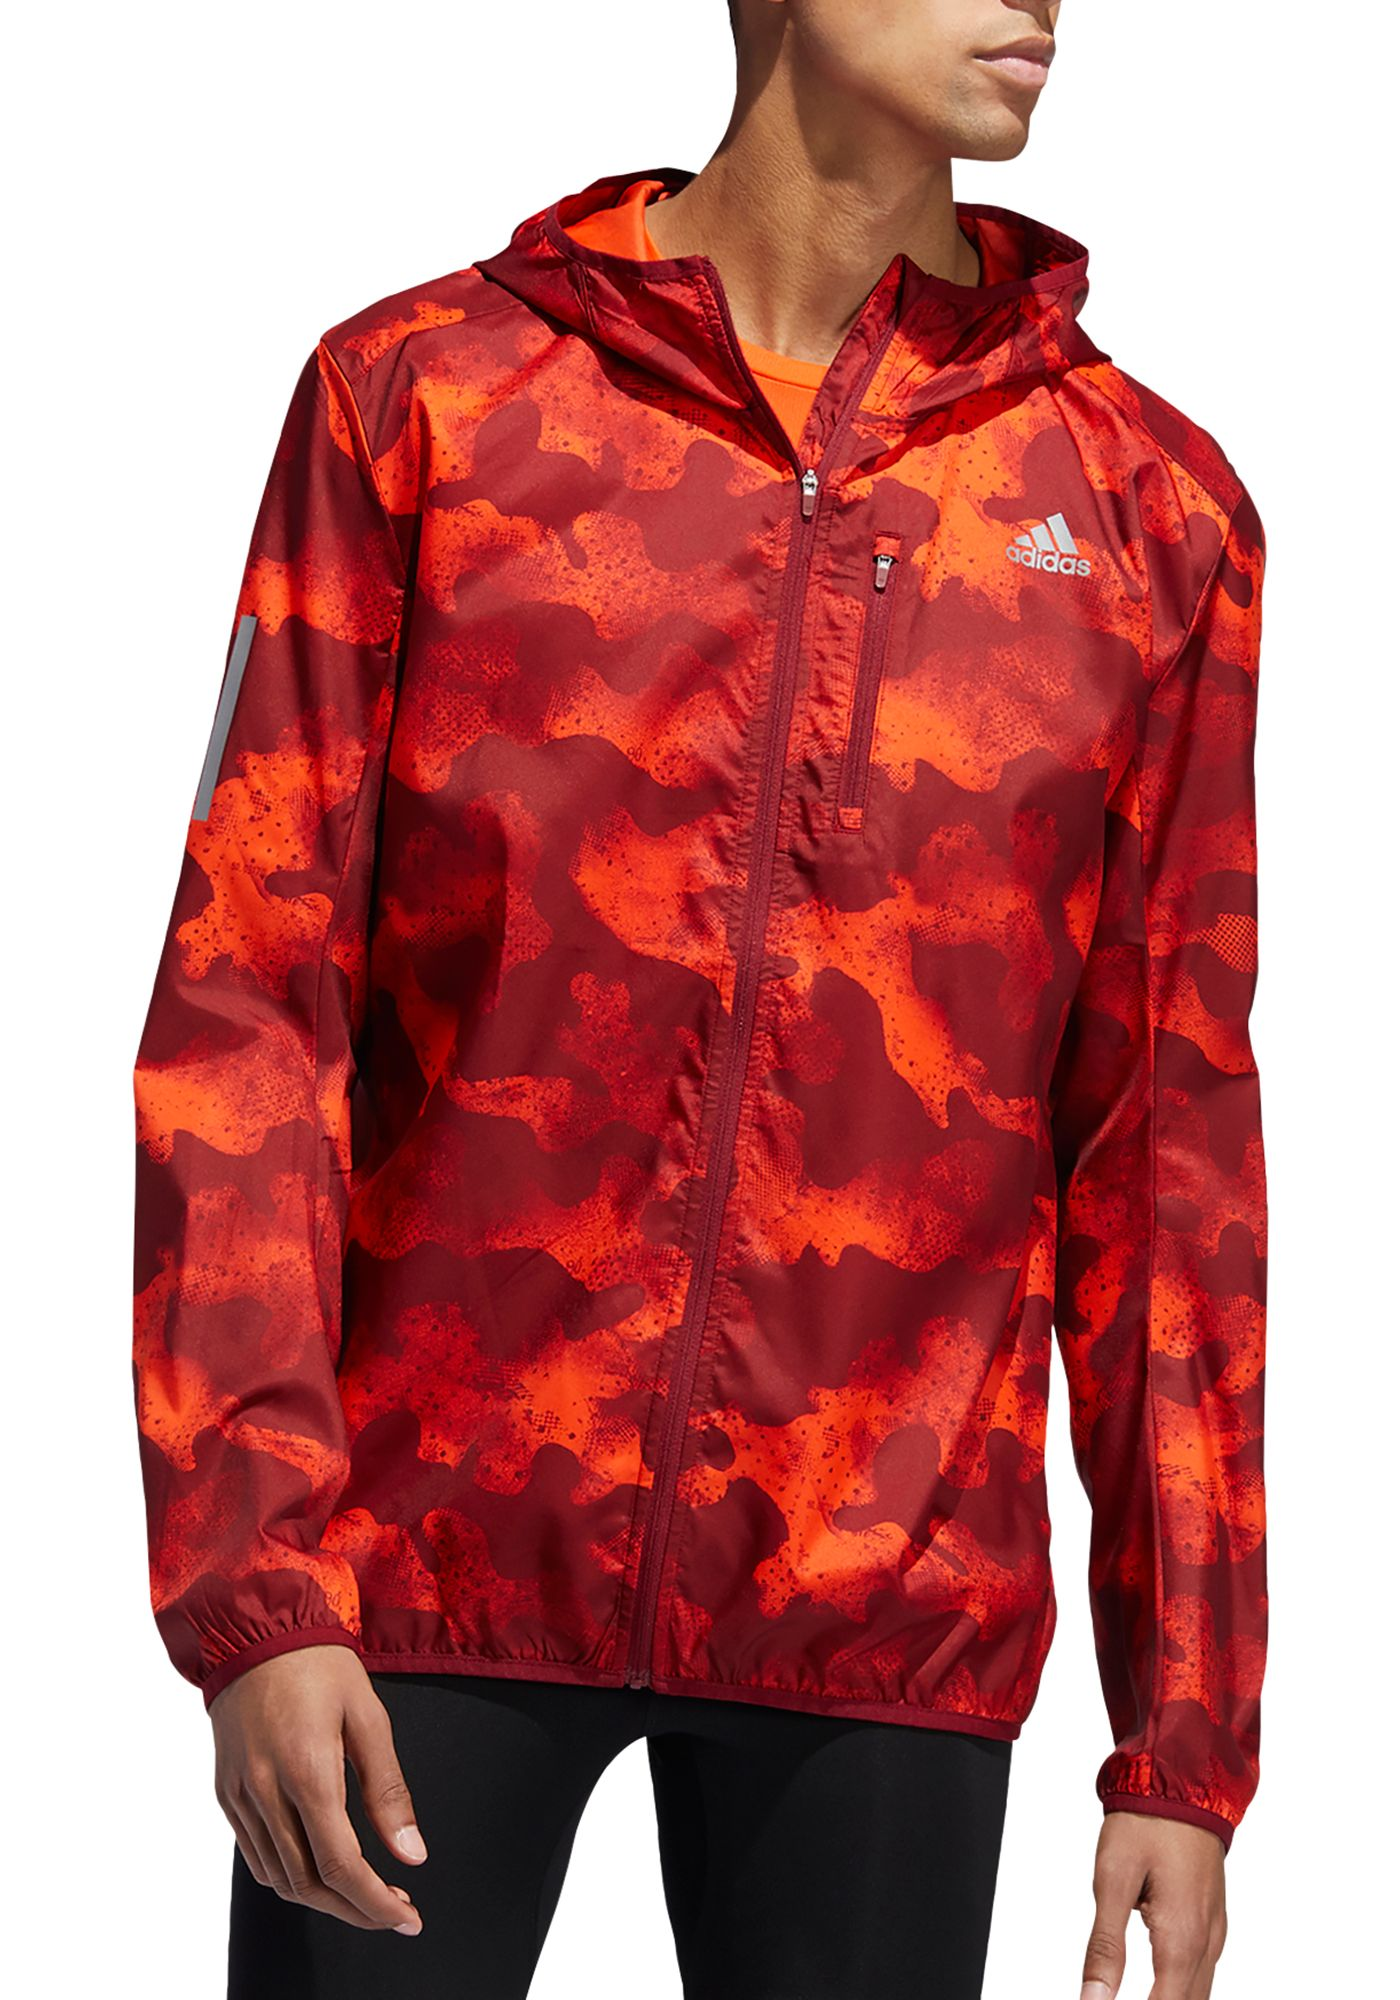 adidas Men's Own The Run Camouflage Running Jacket